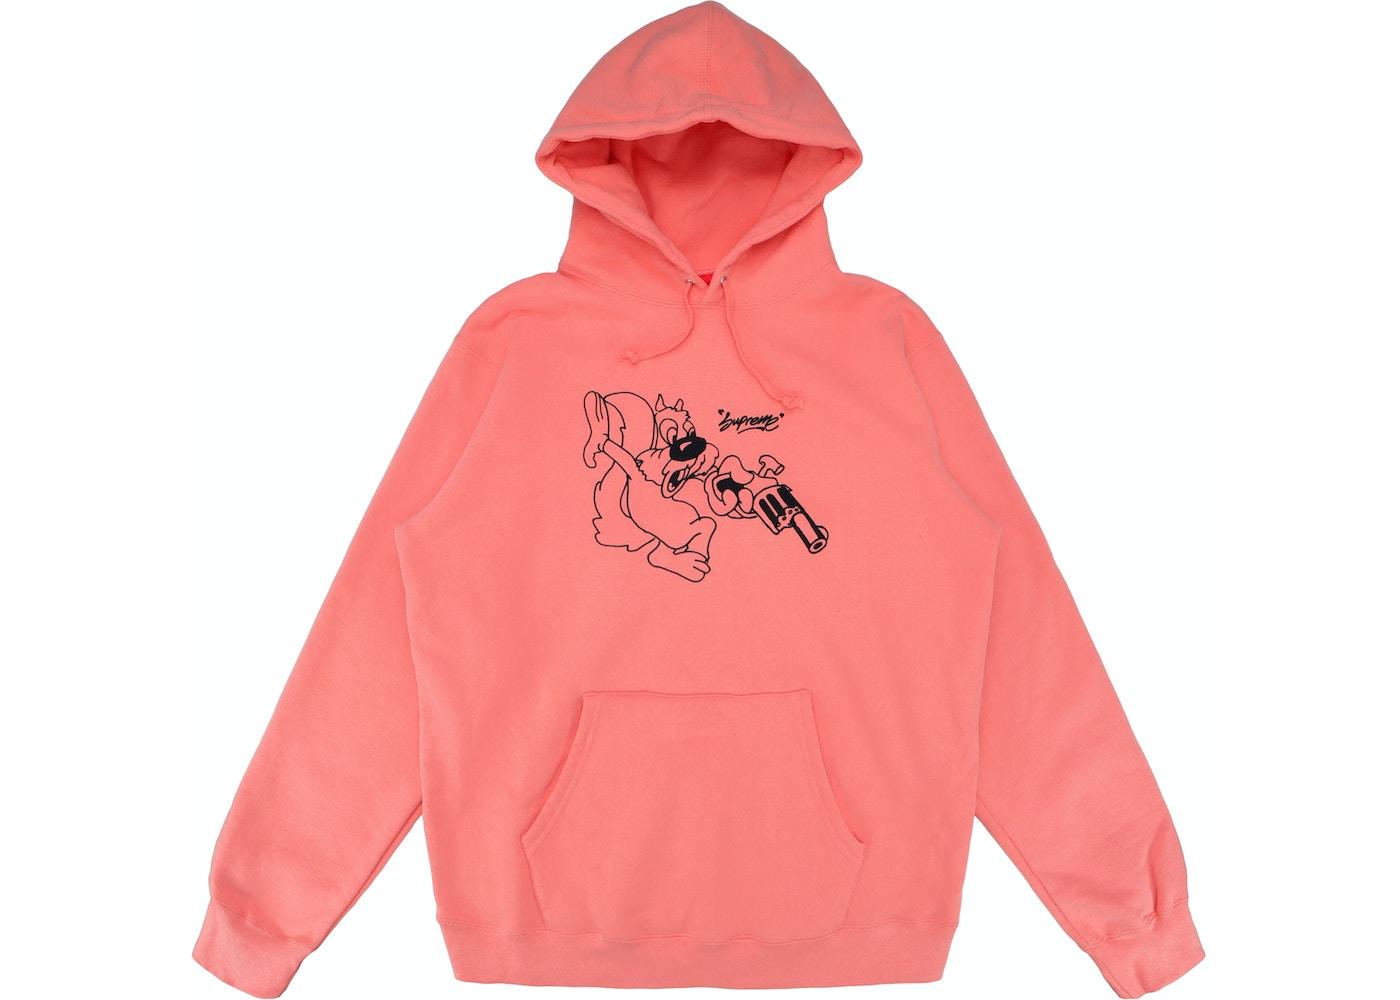 2a7e98097555 Supreme Lee Hooded Sweatshirt Coral - SS18